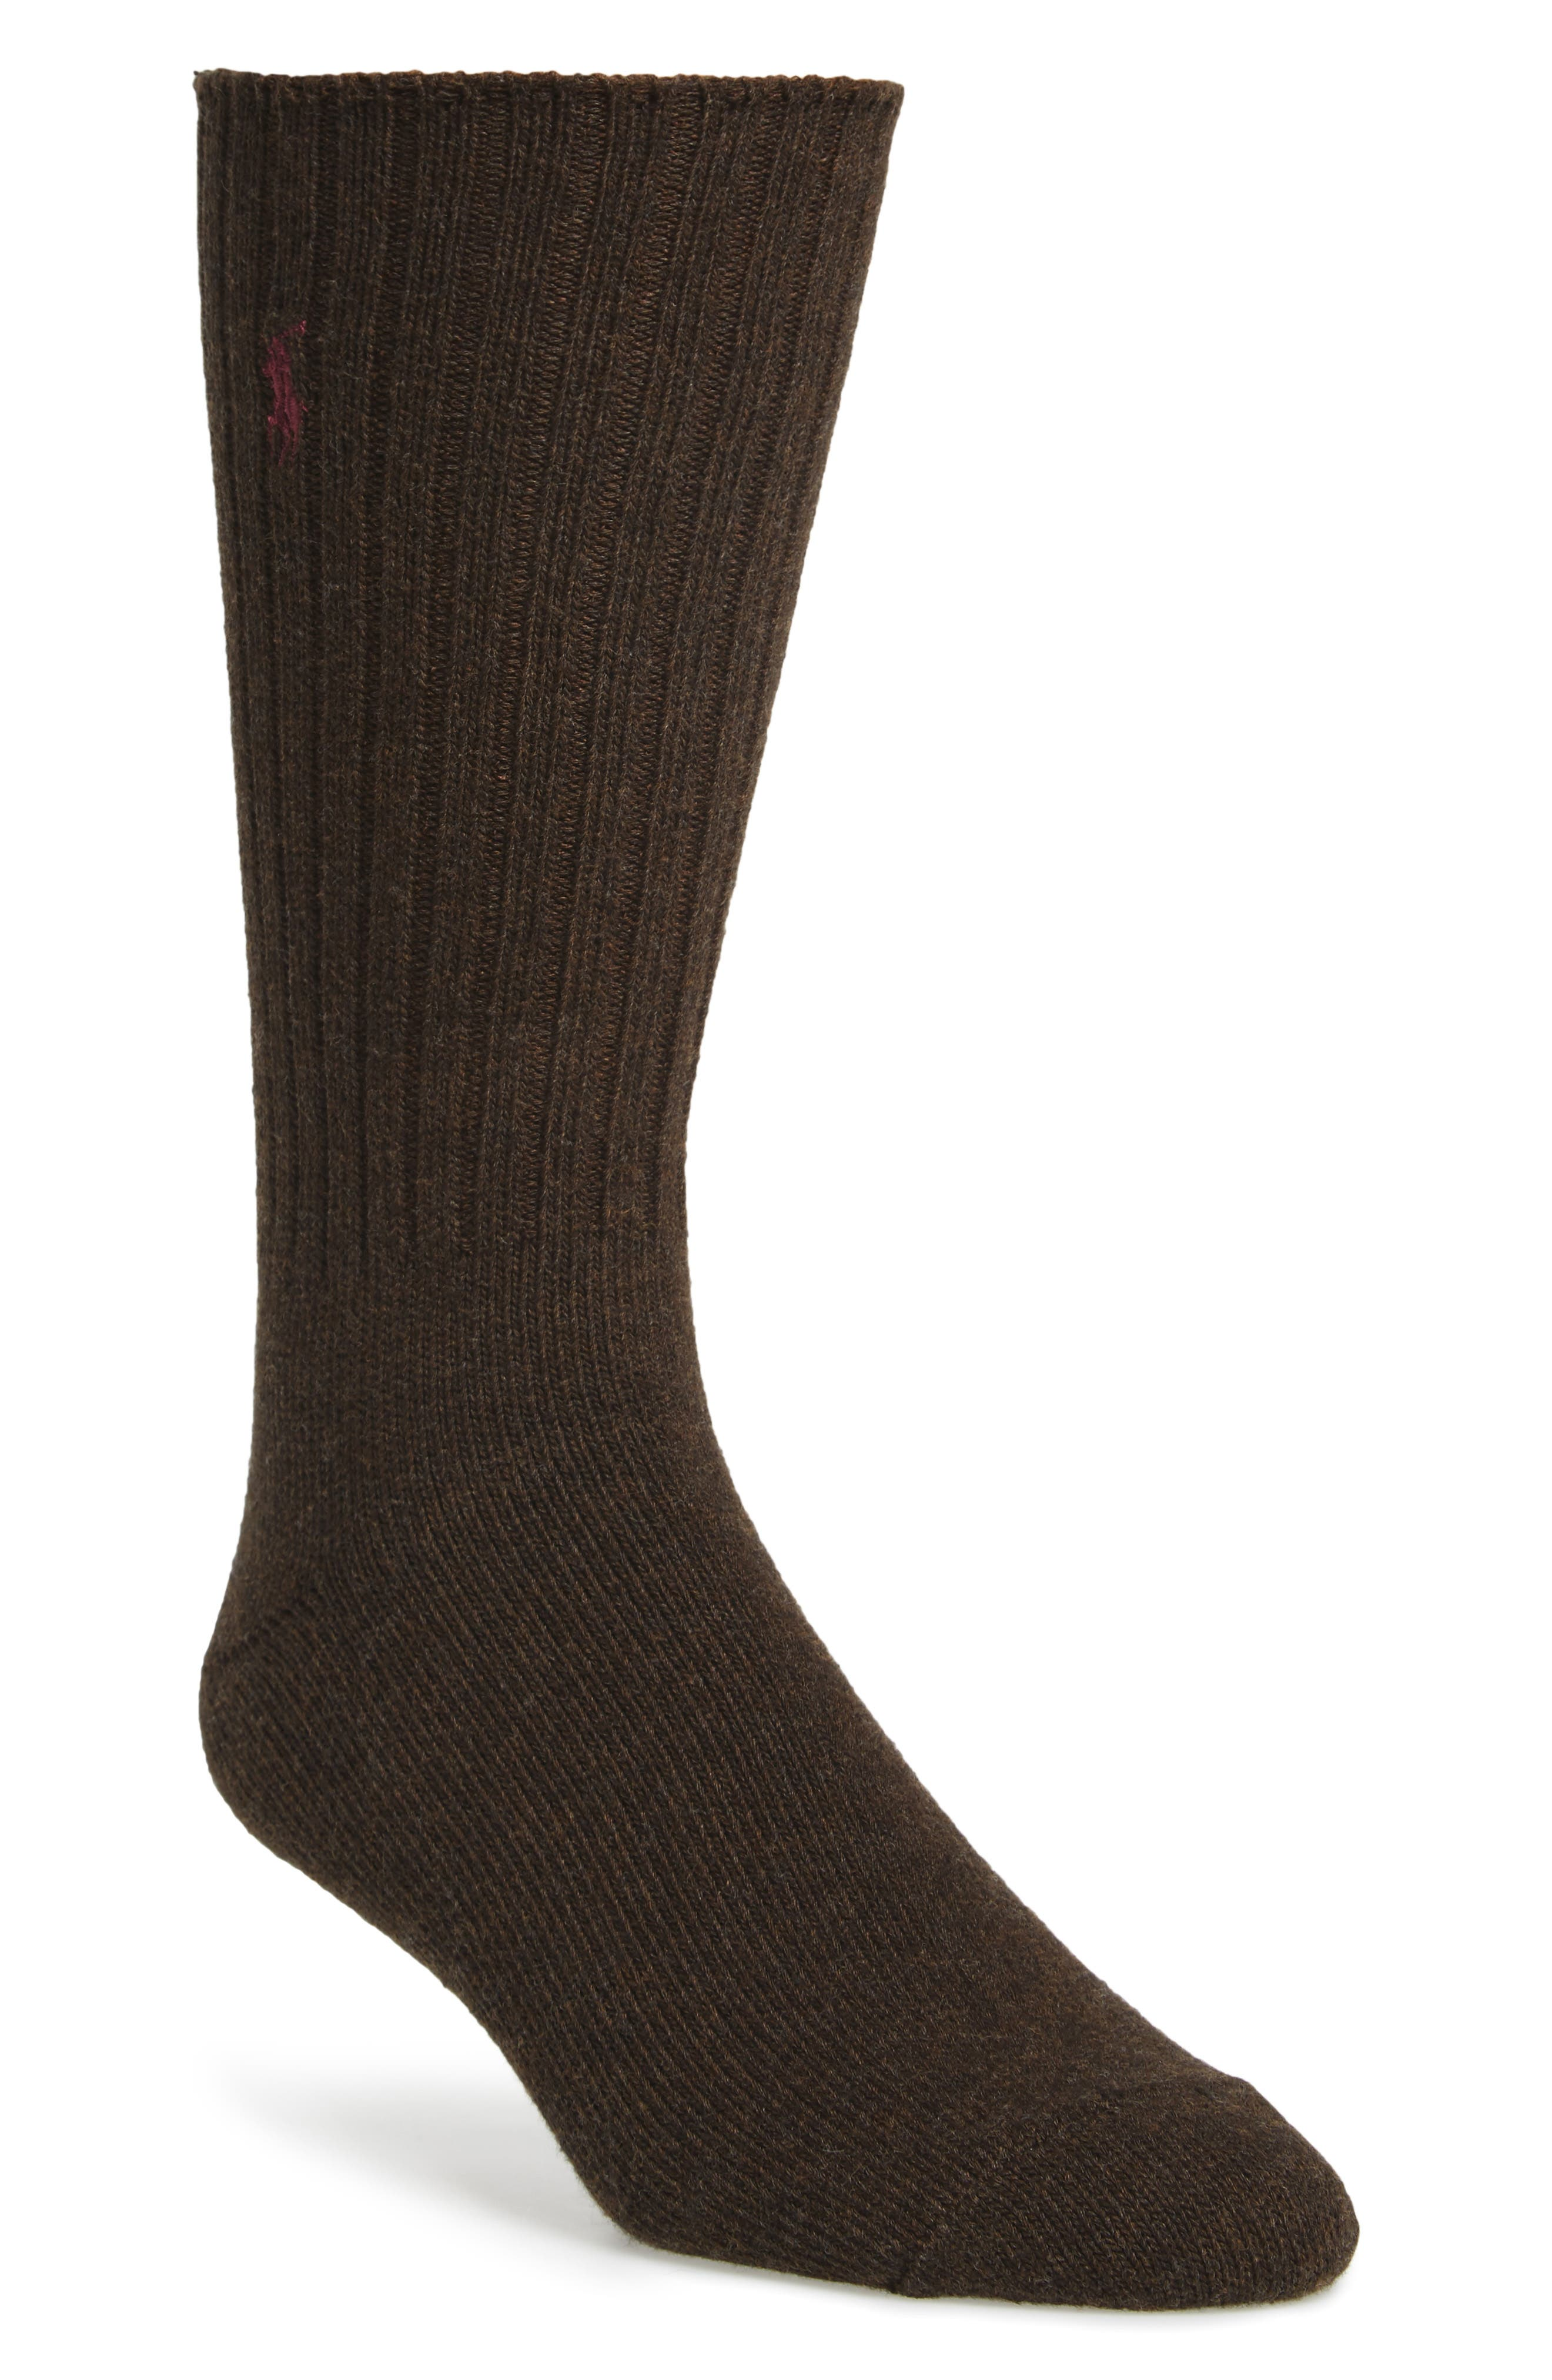 Crew Socks,                         Main,                         color, Bark